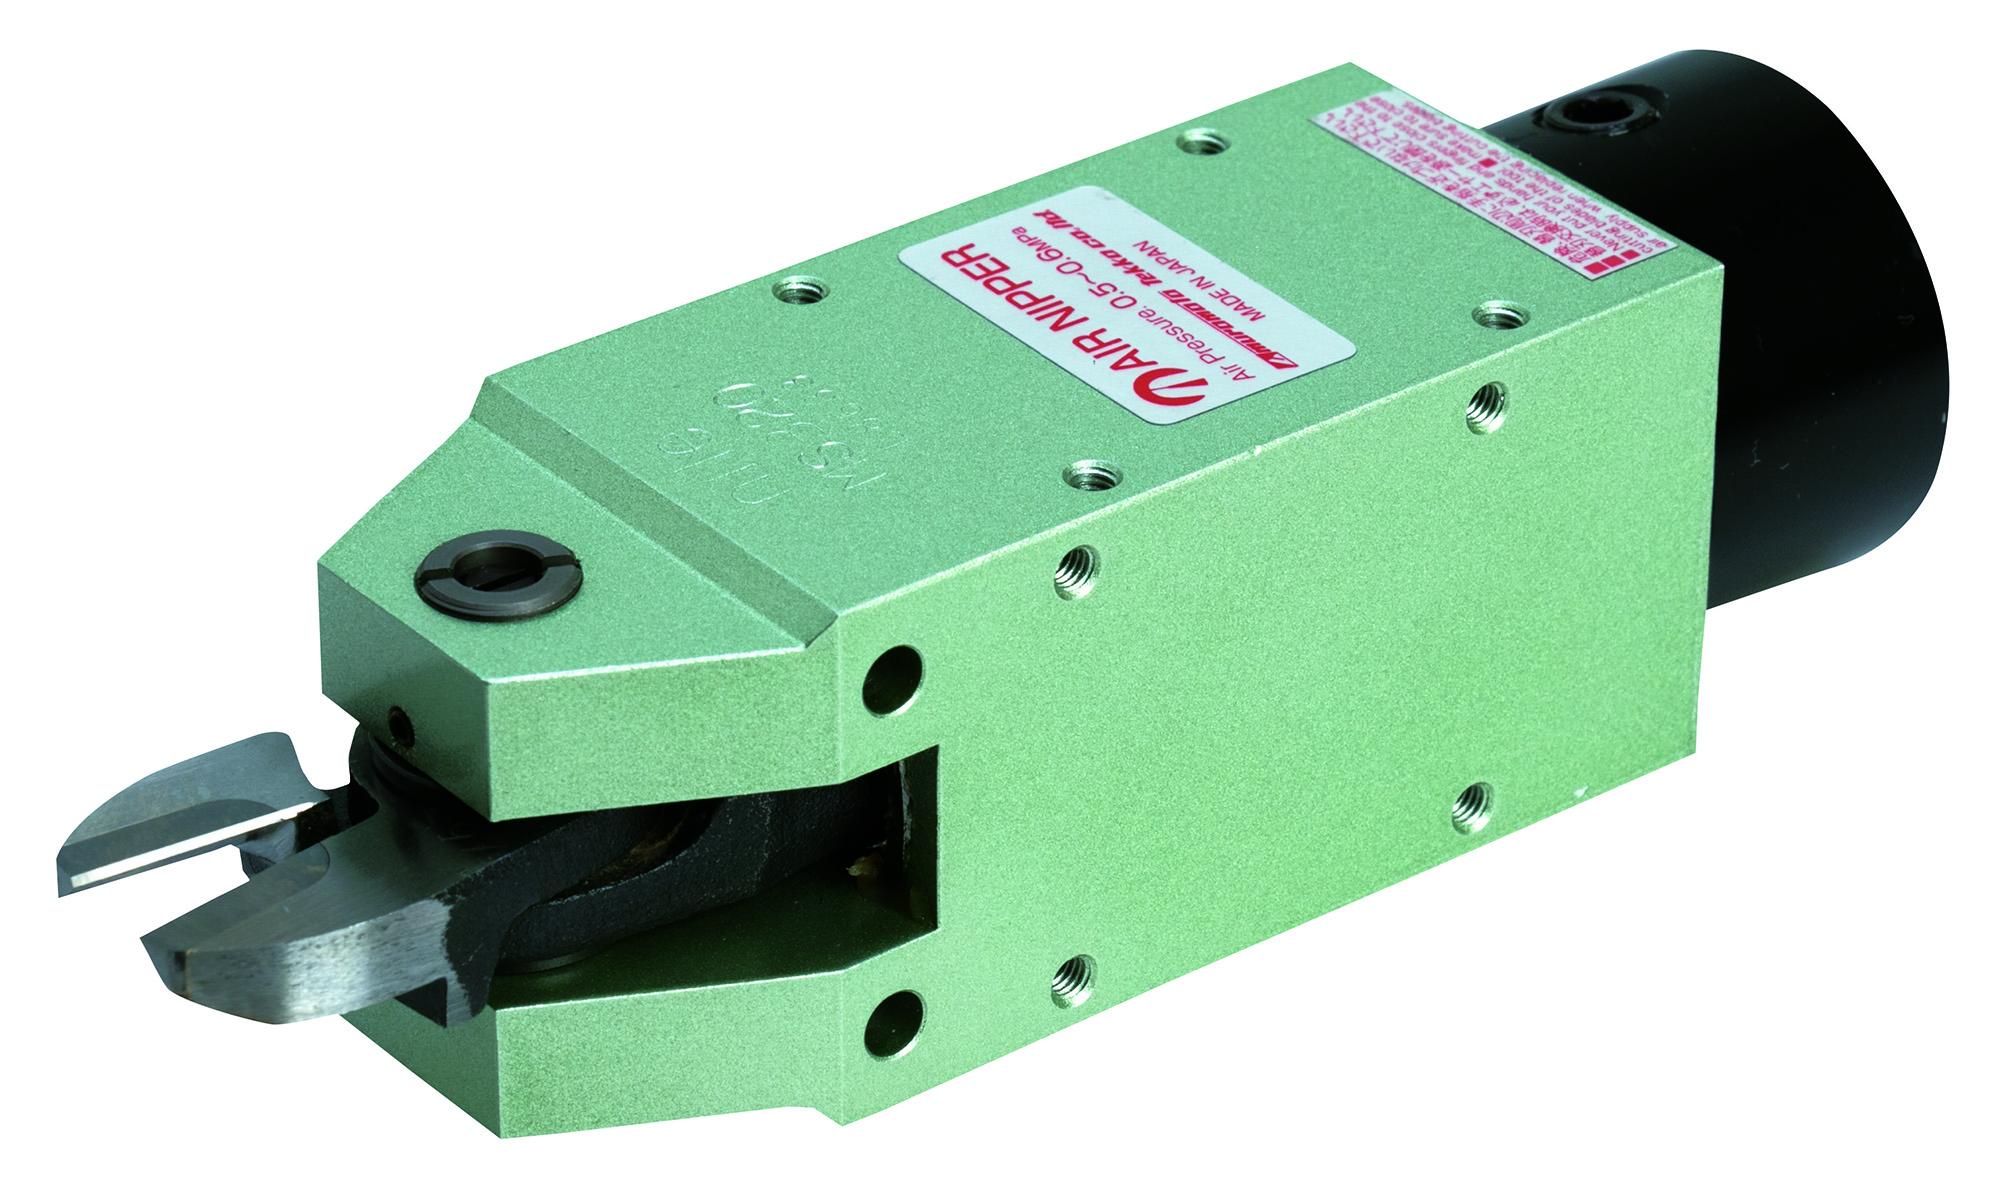 MSB型 機械取付式角型ガタ防止エアーニッパ